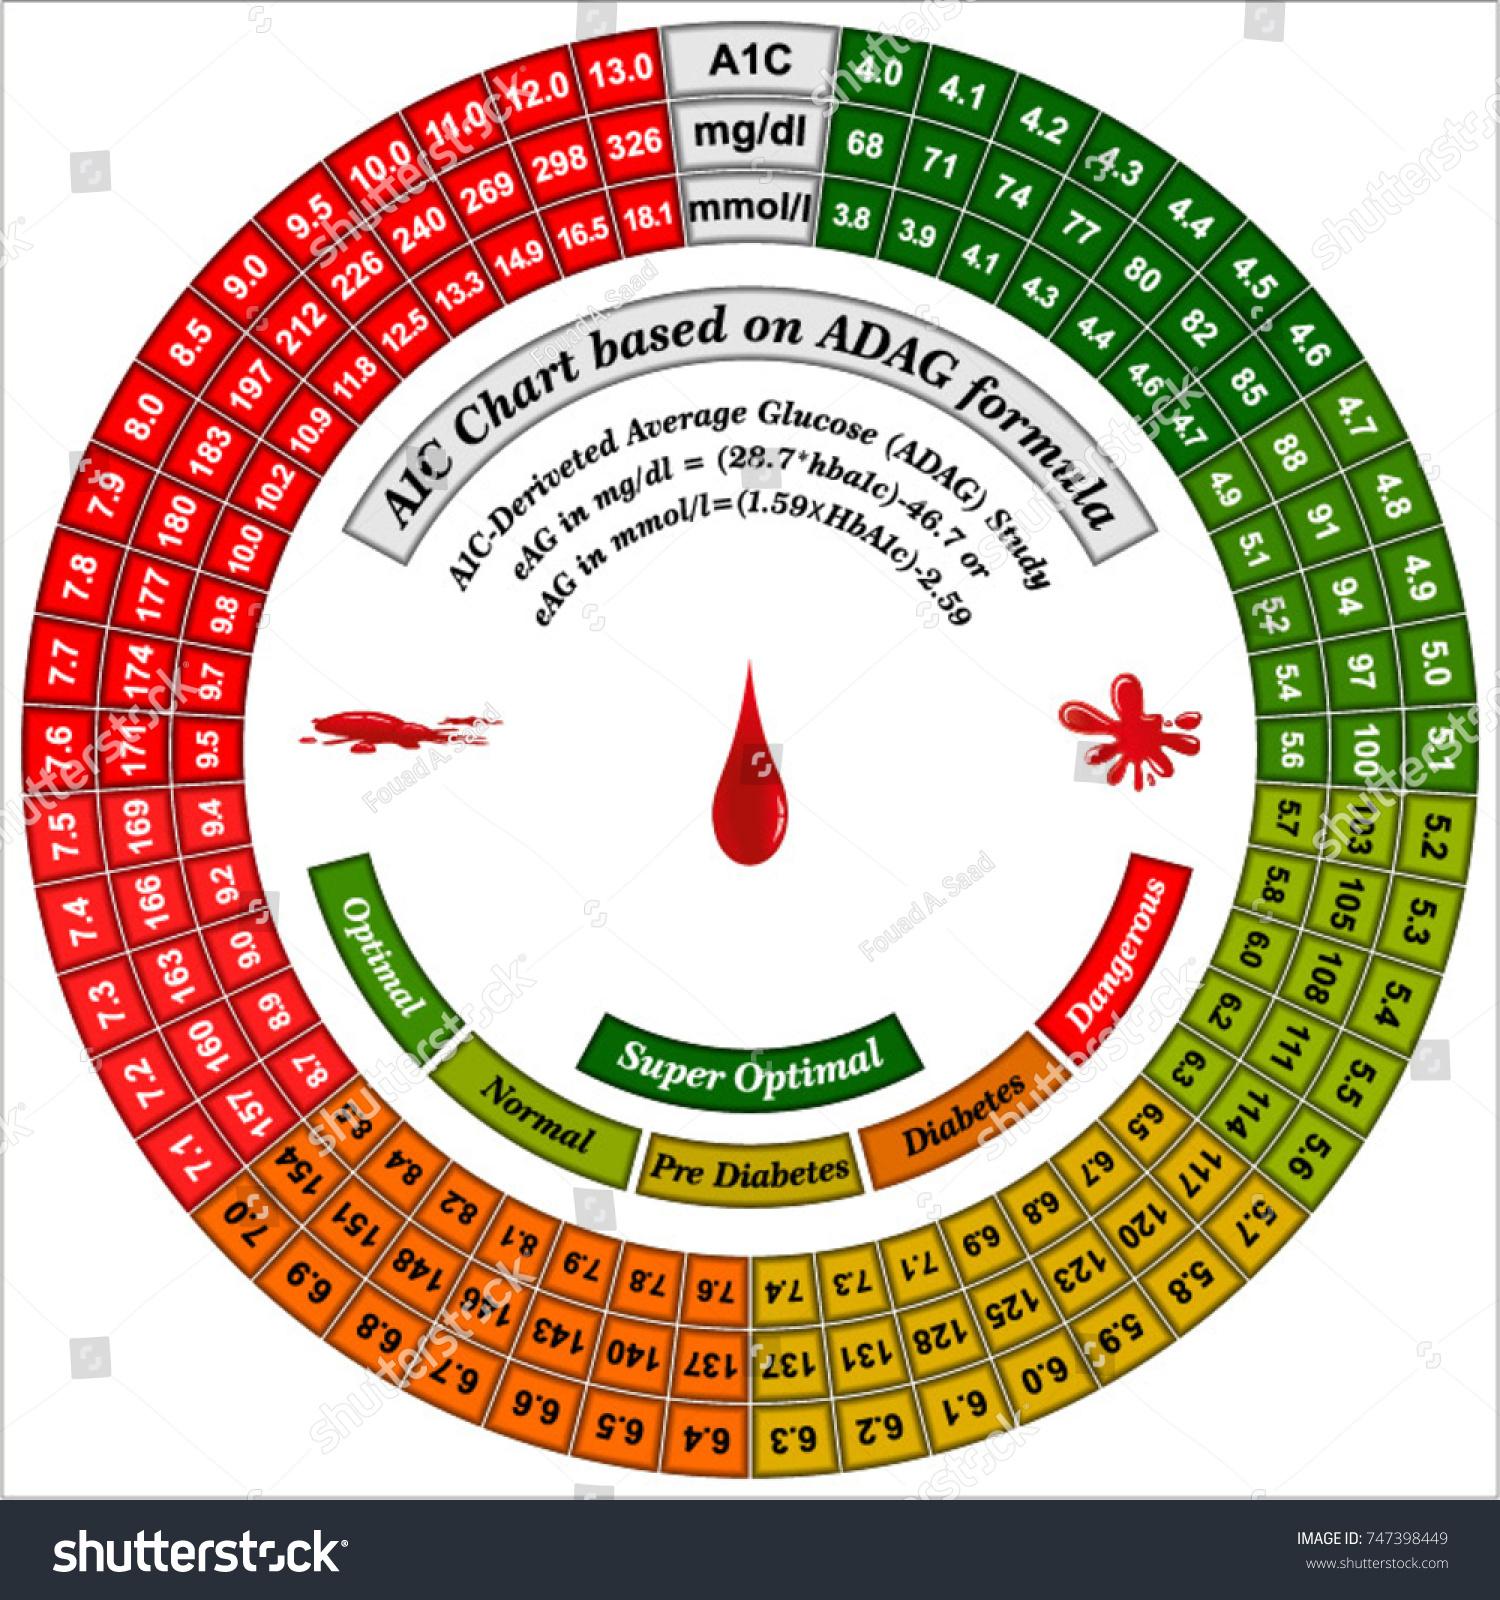 Essential diabetes control charts hba1c chart stock vector essential diabetes control charts hba1c chart has hba1c to bs conversion using the adag formula nvjuhfo Choice Image